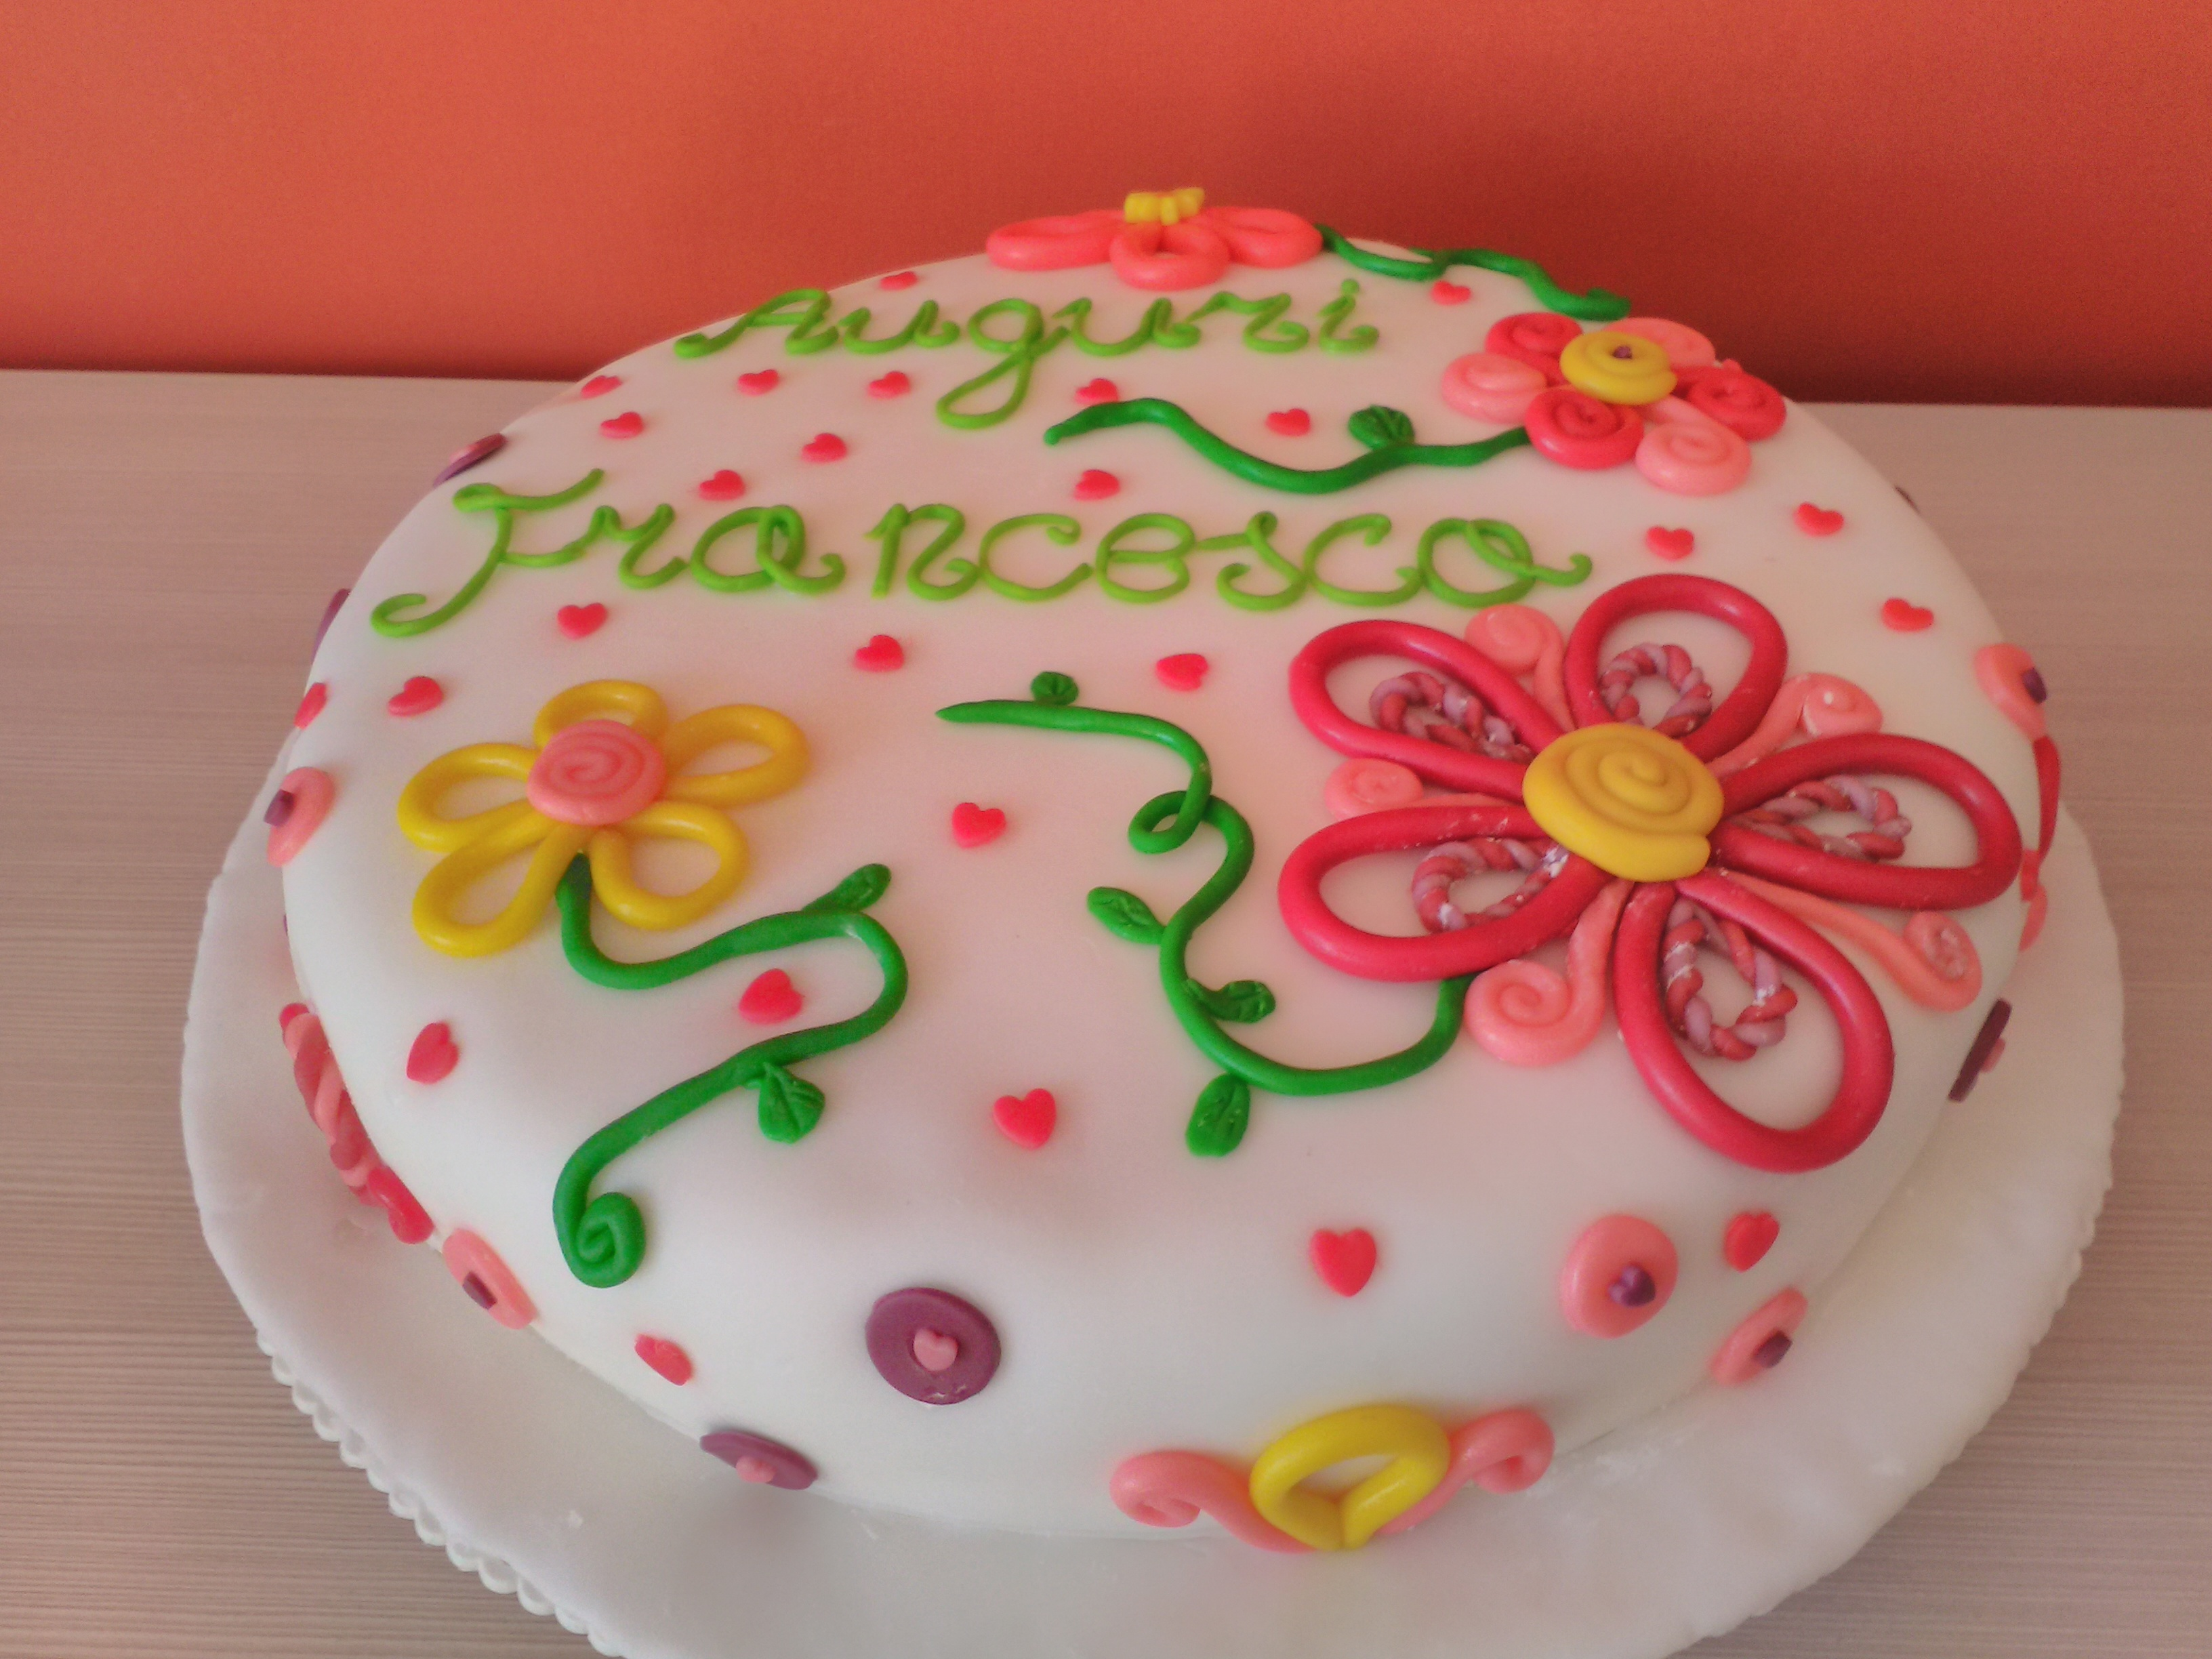 Torta di compleanno sfumature dolci e salate - Torte salate decorate ...